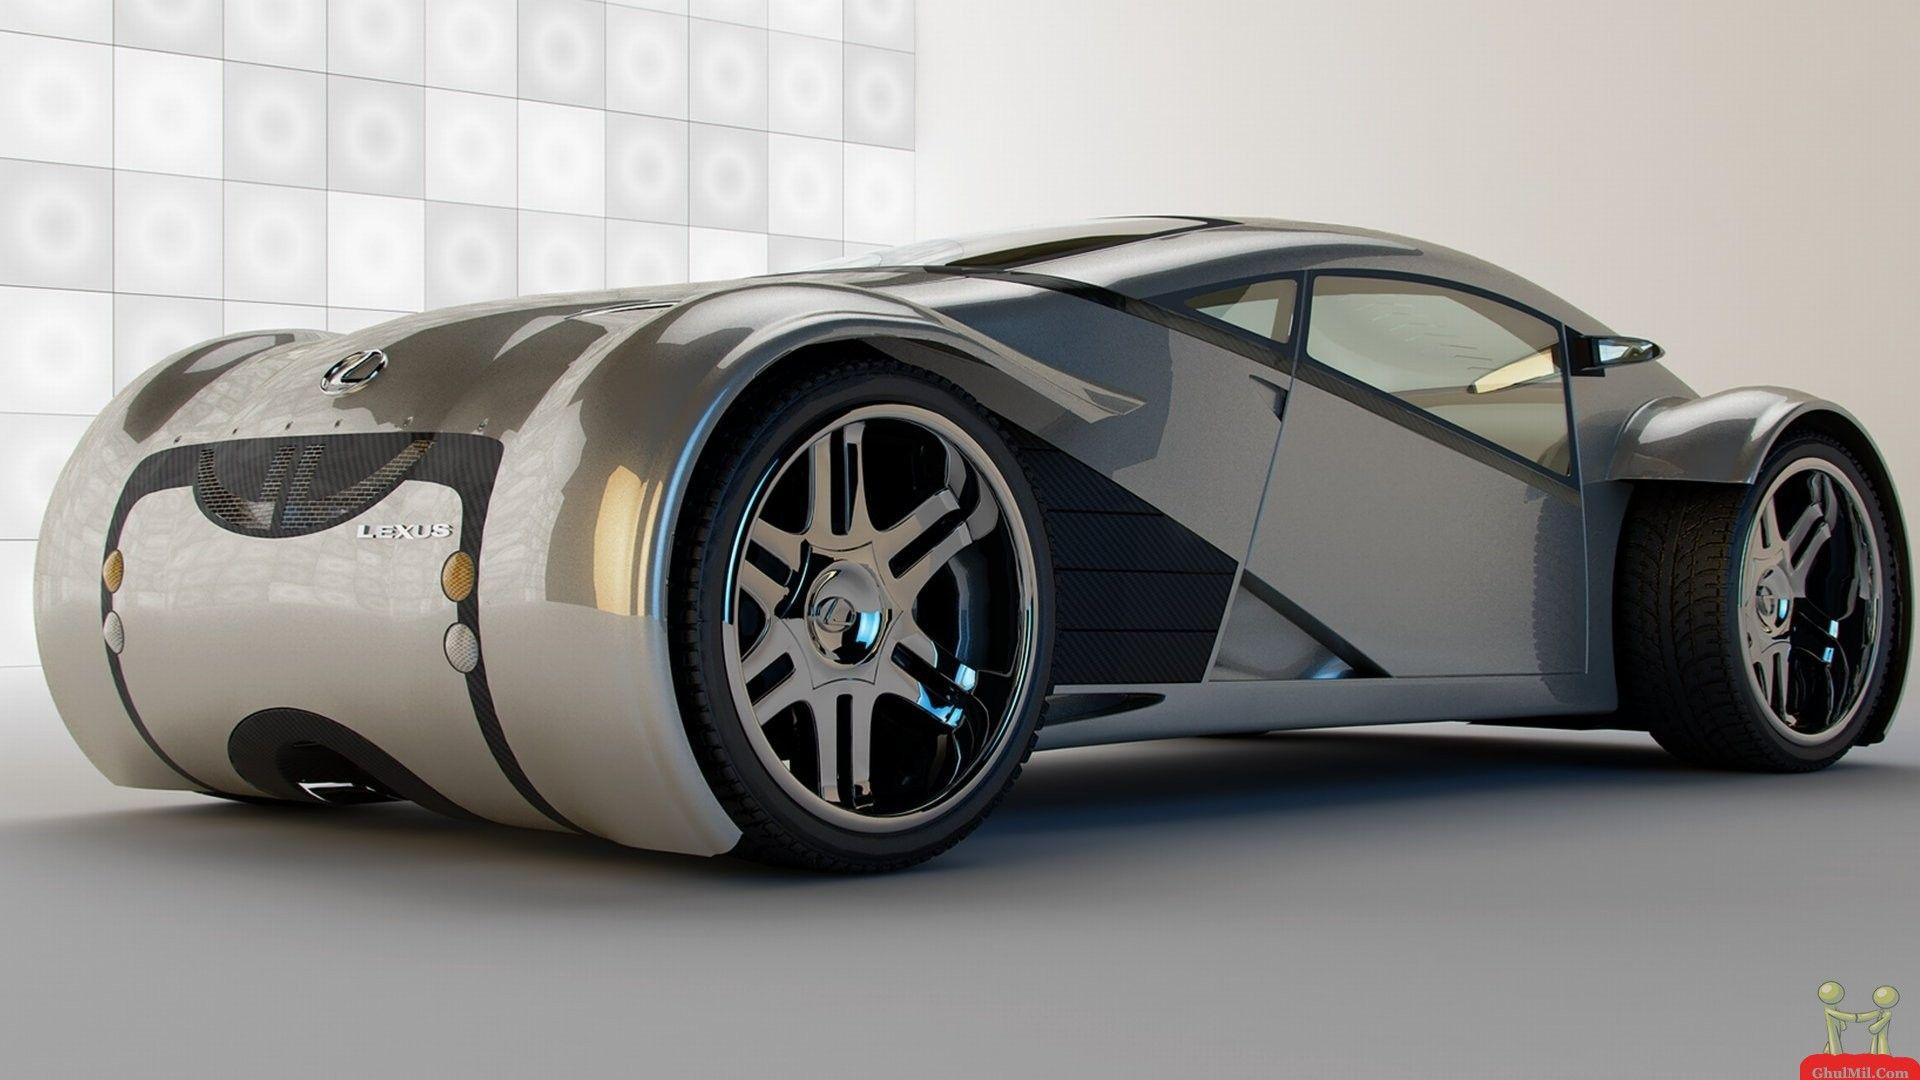 Amazing Cars | Superb Amazing Lexus Car Wallpaper | Cars ...